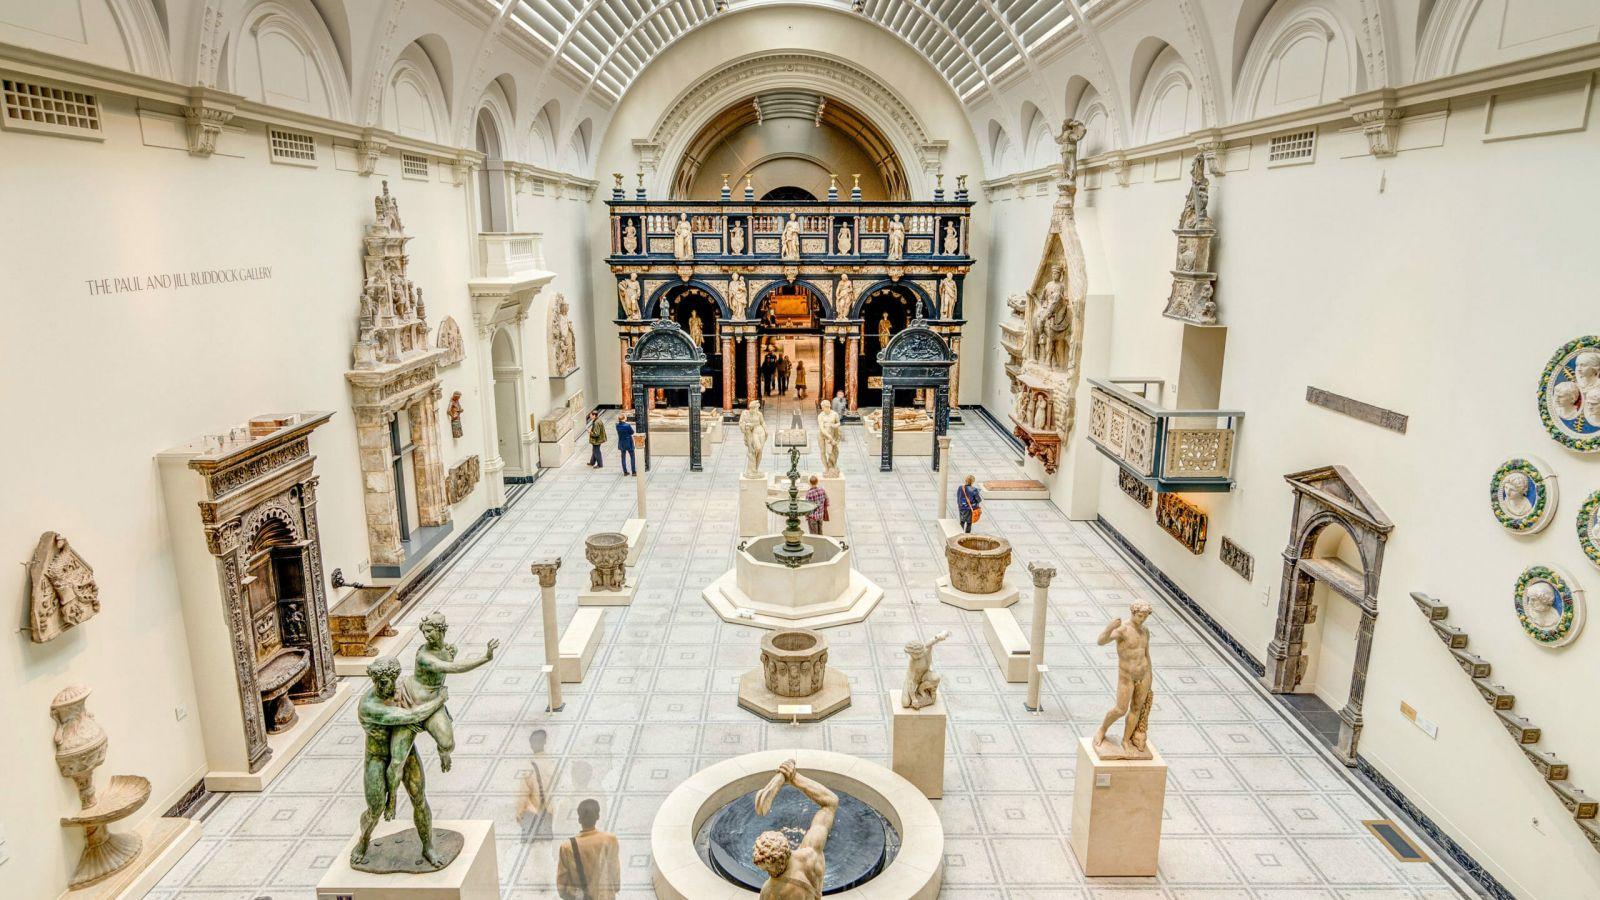 Victoria & Albert Museum: Έκθεση με τα αντικείμενα της πανδημίας [pic]